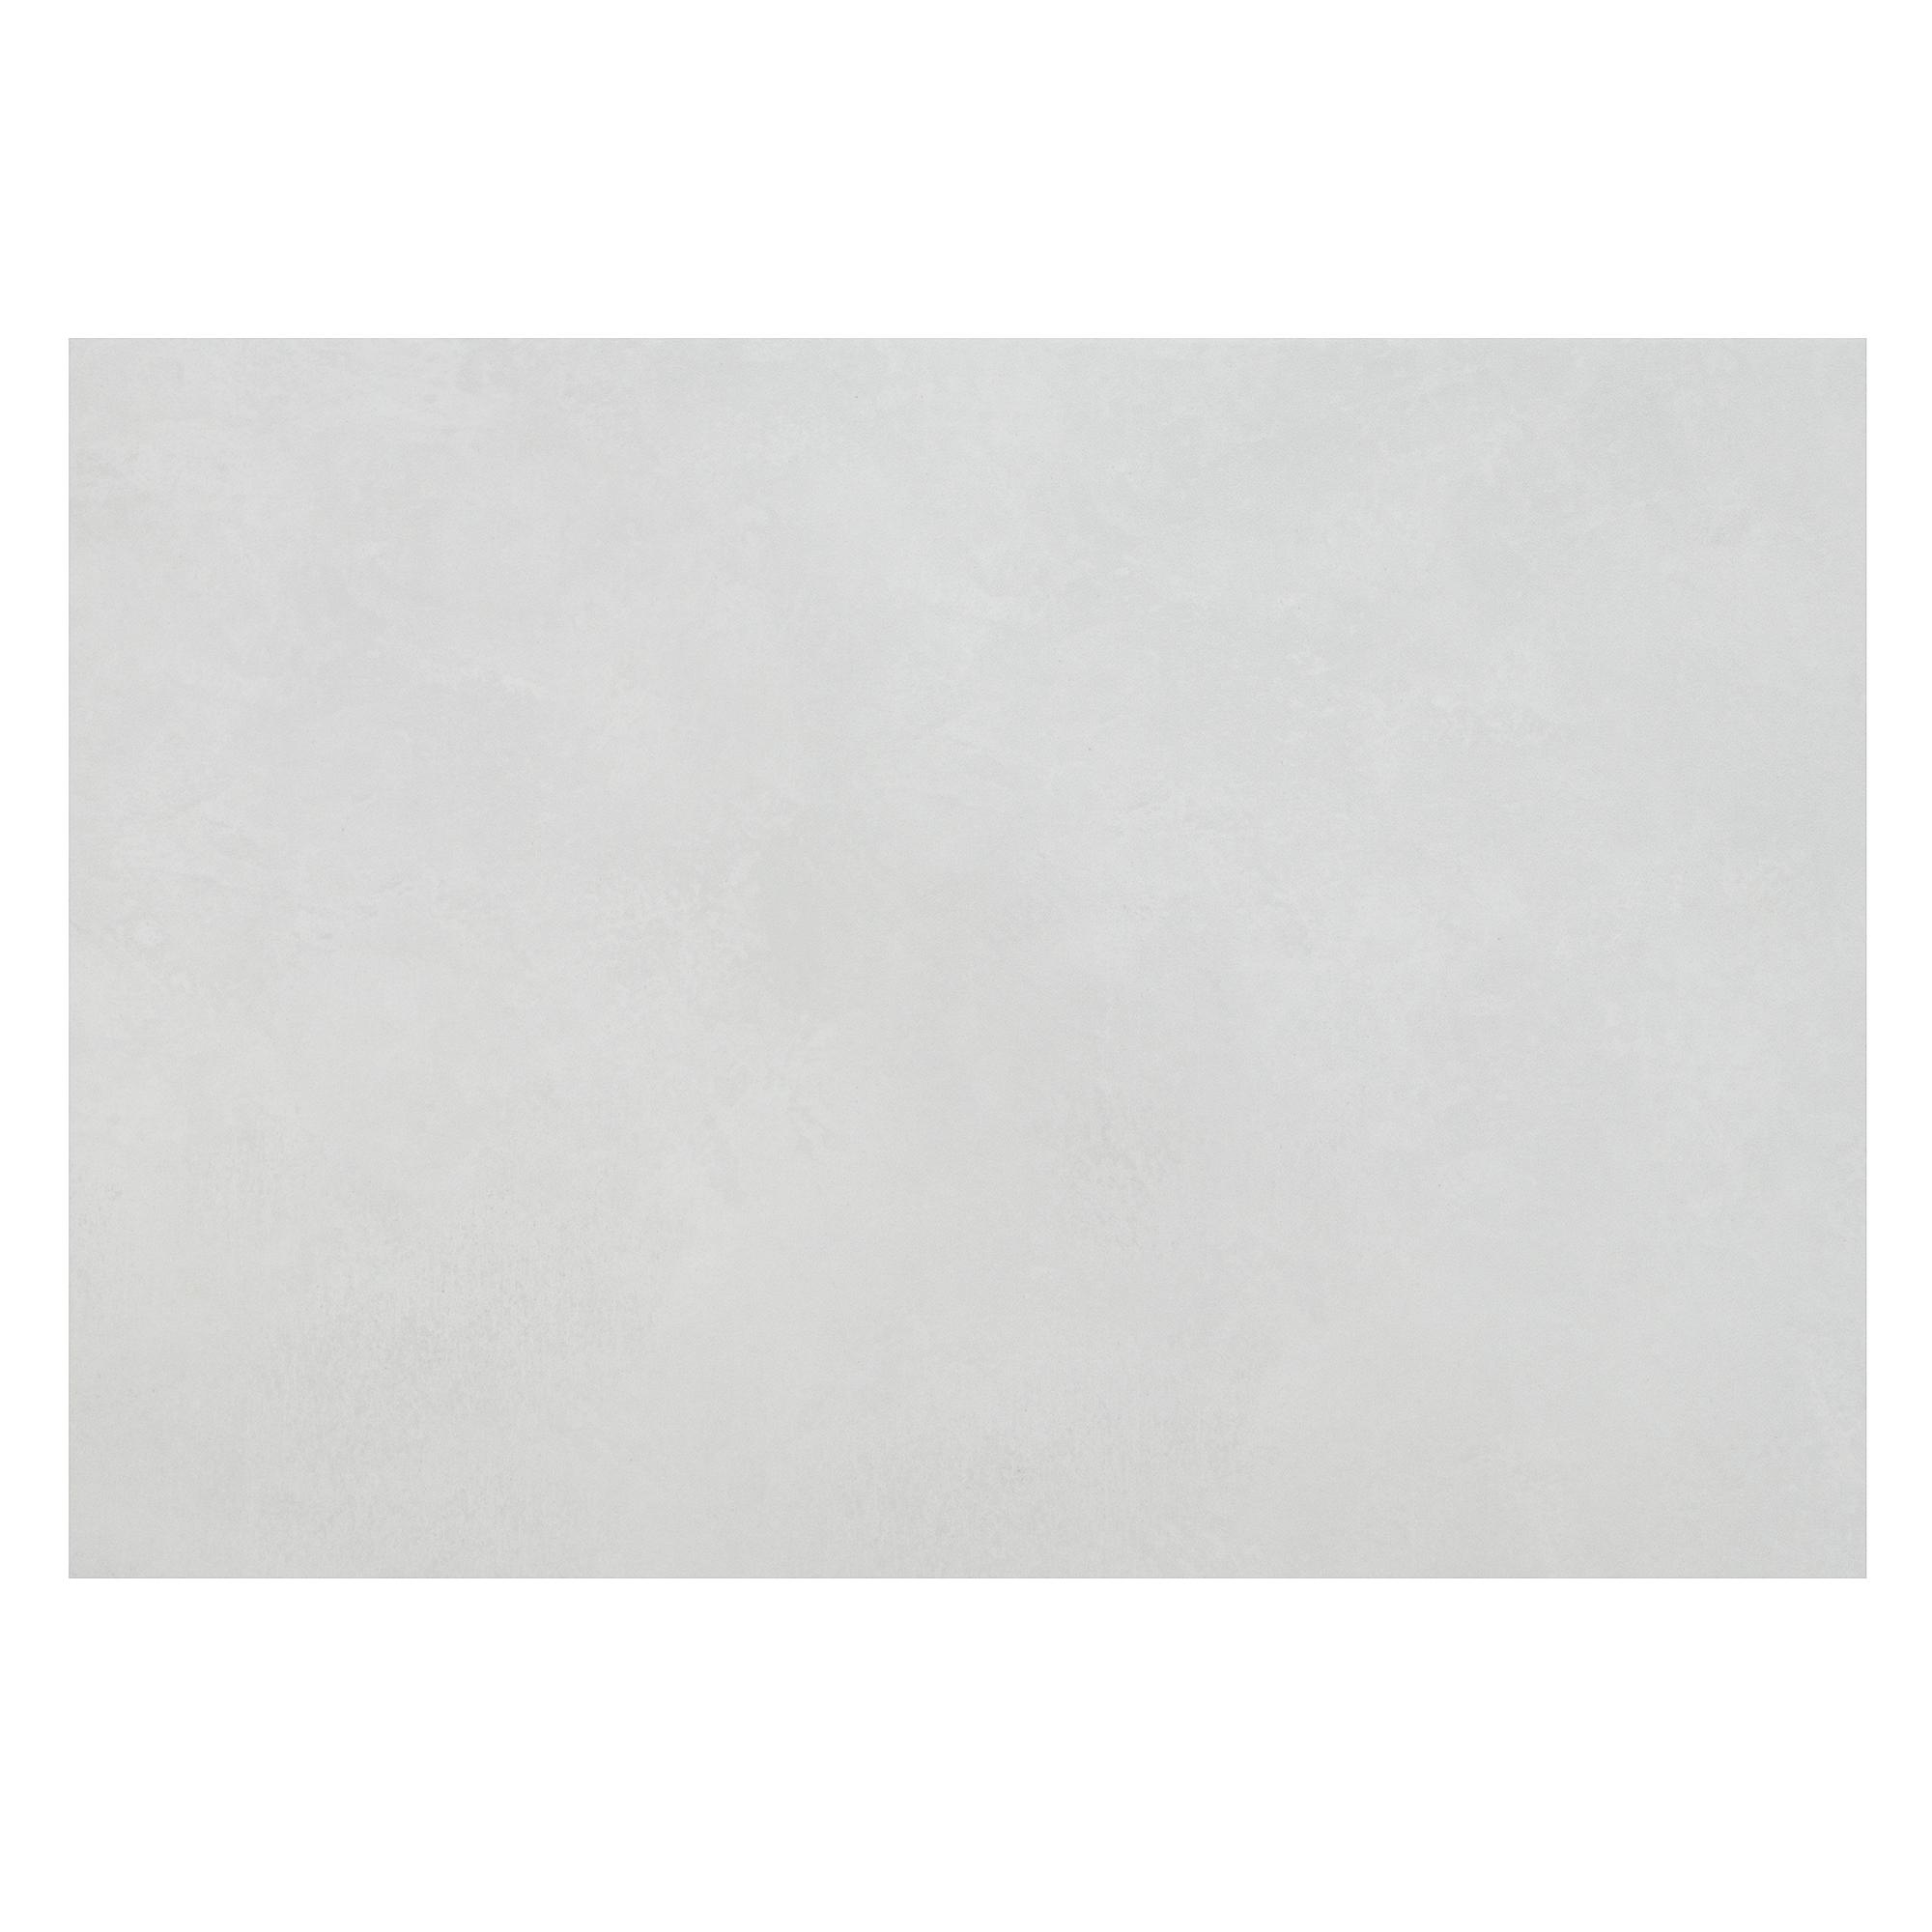 Фото - Плитка настенная Cristacer AMBERES WHITE 20х60 плитка напольная cristacer avenue grey gr 59 2х59 2